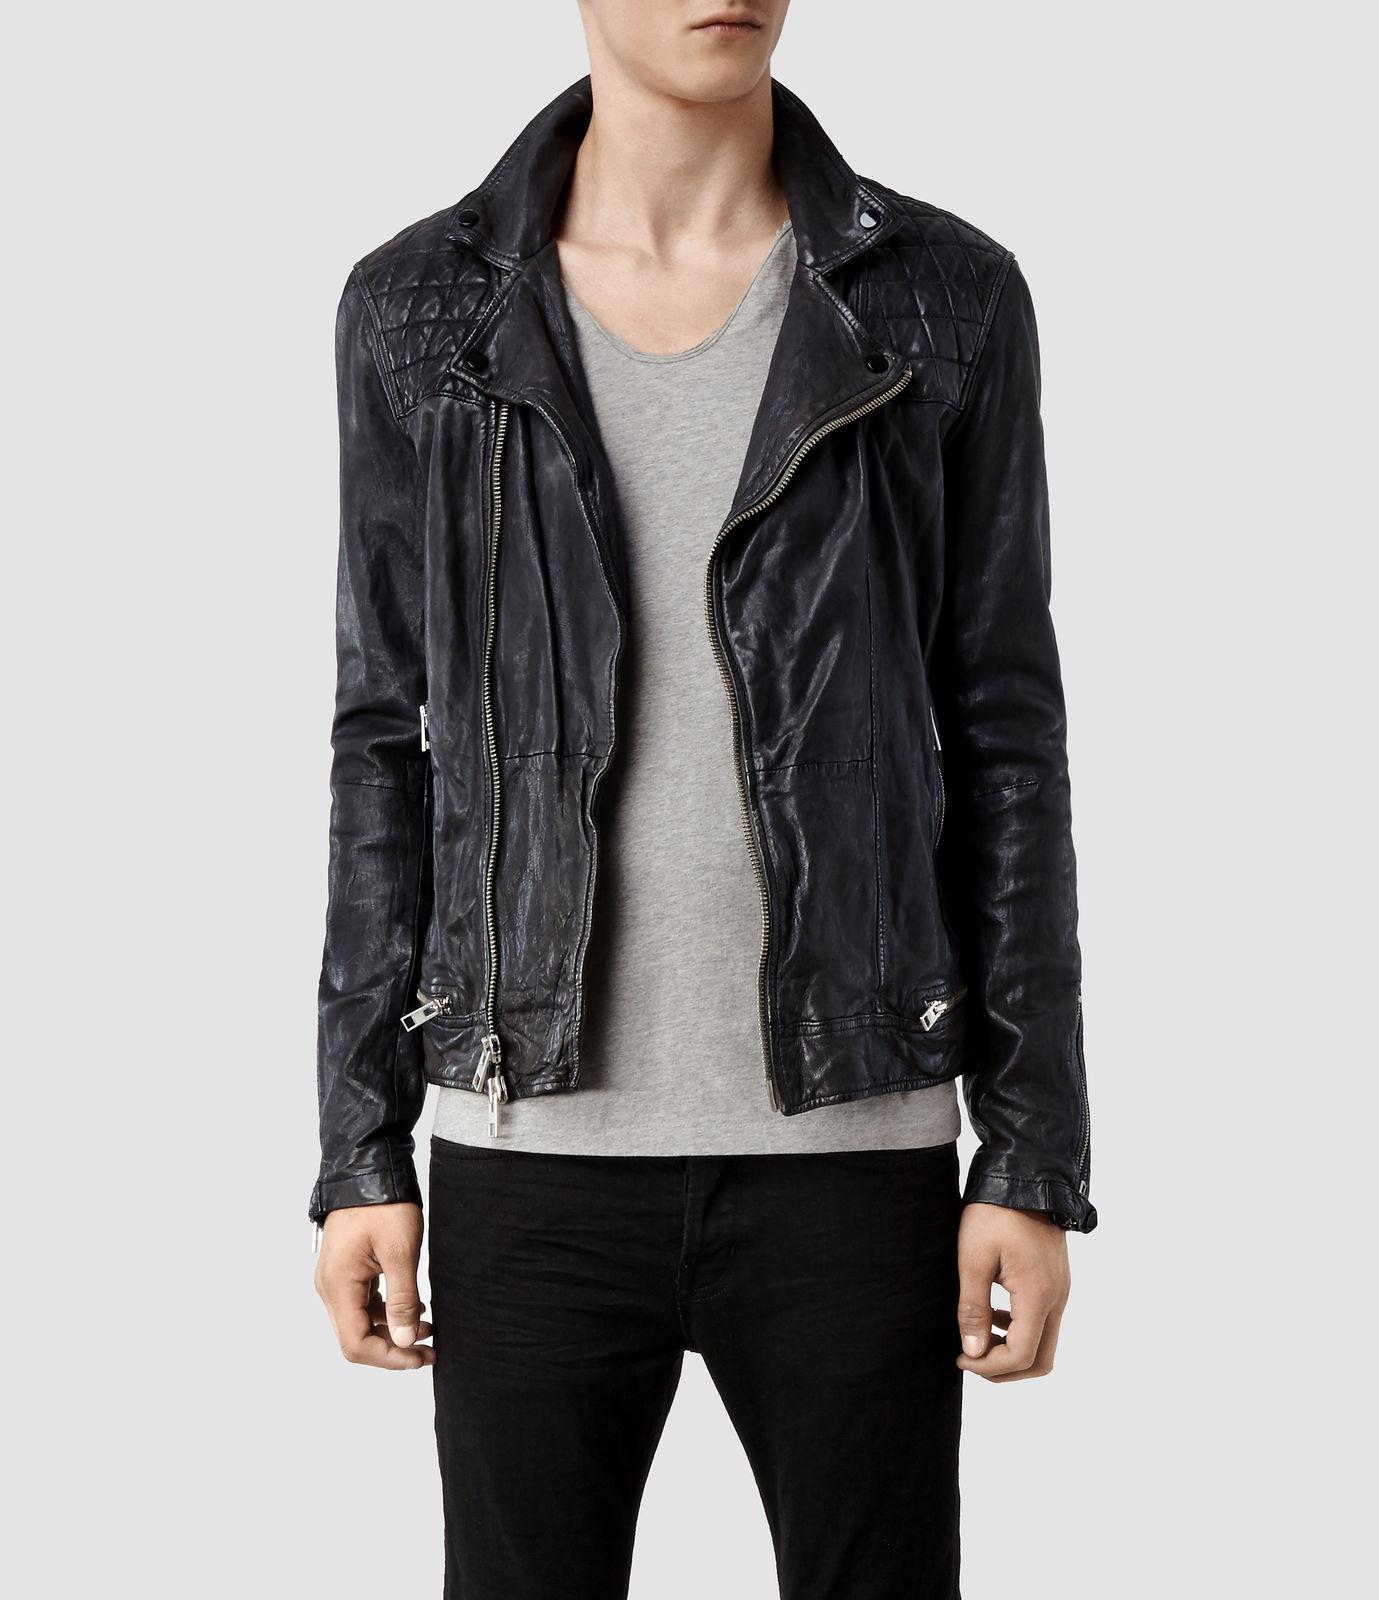 Klaus mikaelson the originals season 2 leather jacket